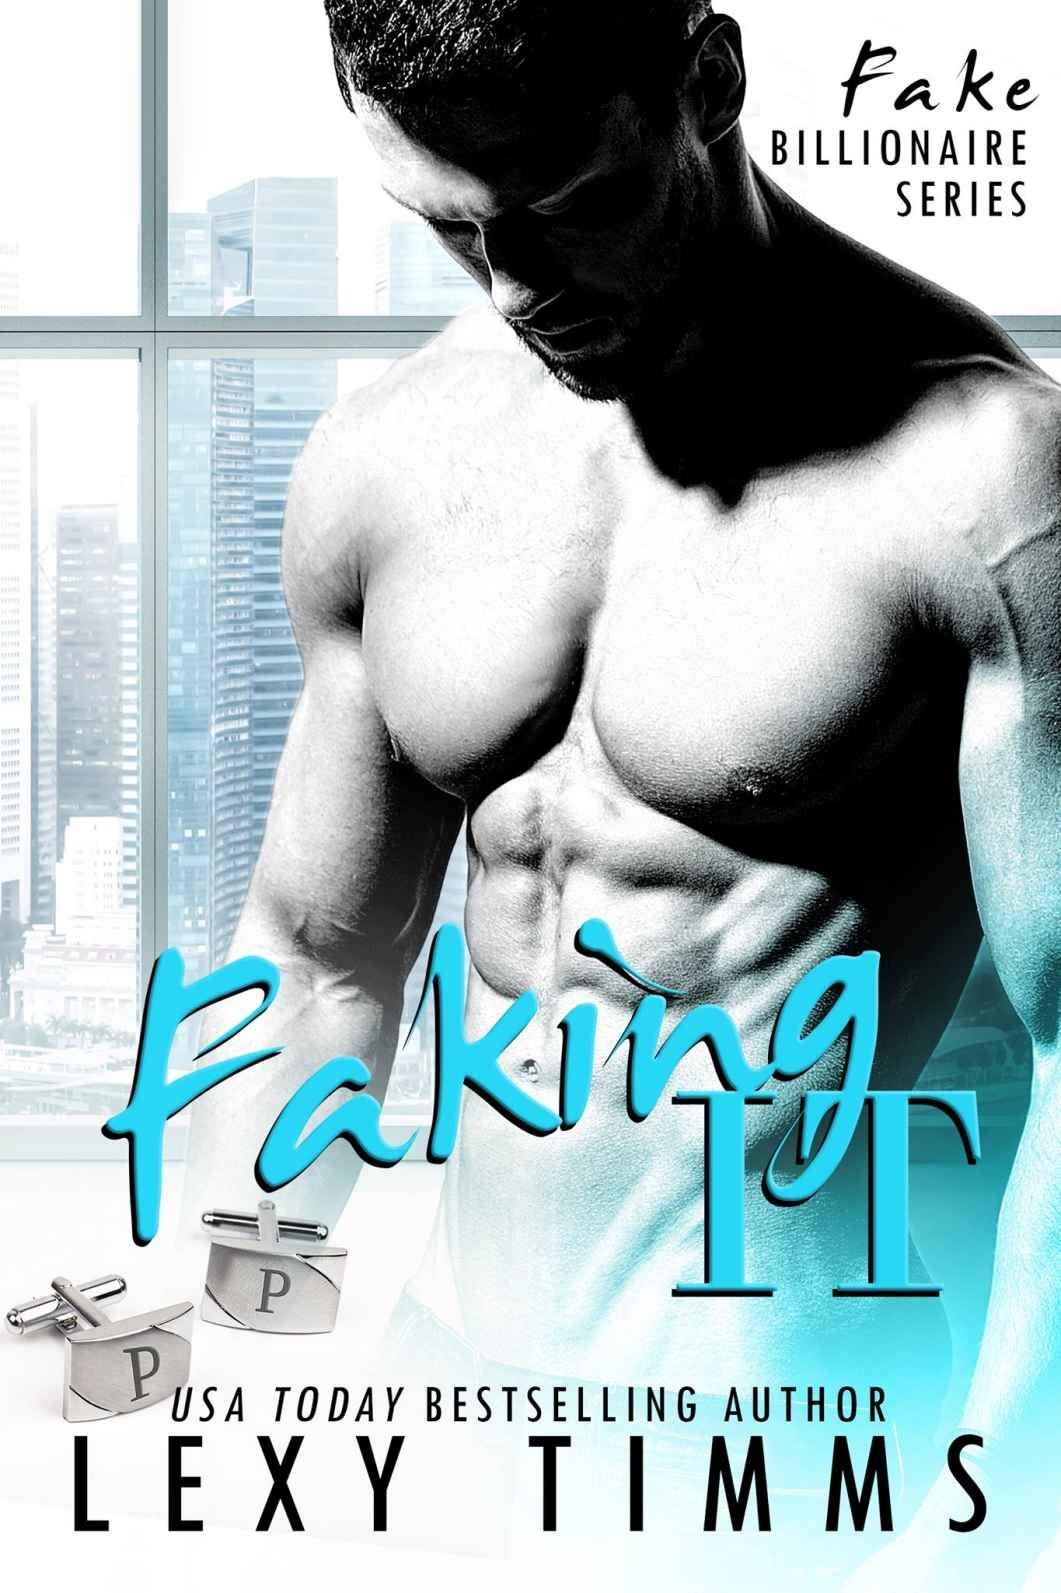 faking it: bbw billionaire romance (fake billionaire series) #free